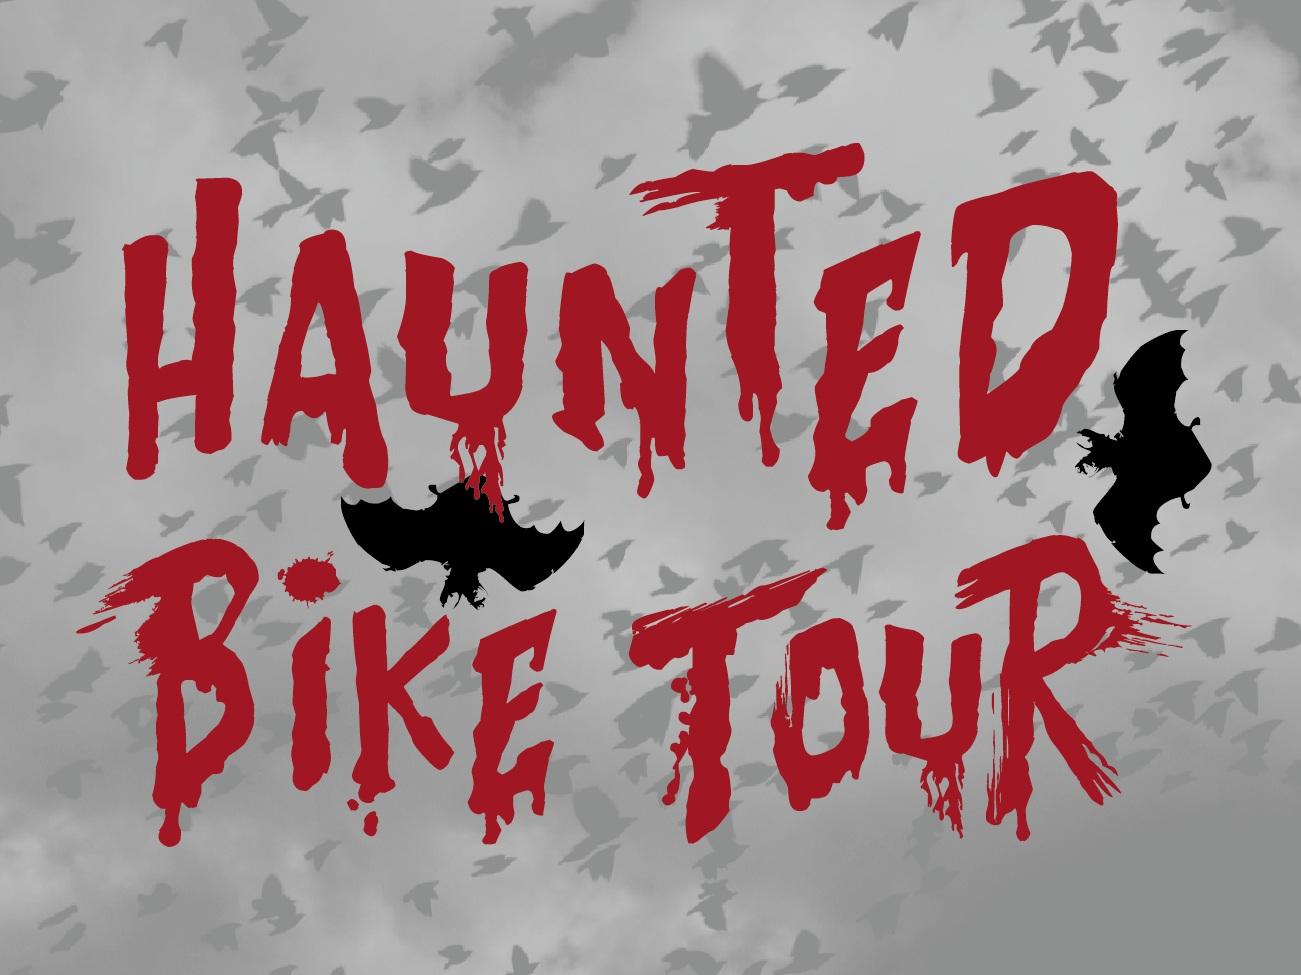 HauntedBike tour - History is stranger than fiction90 minutes, 3 milesMore Details >>